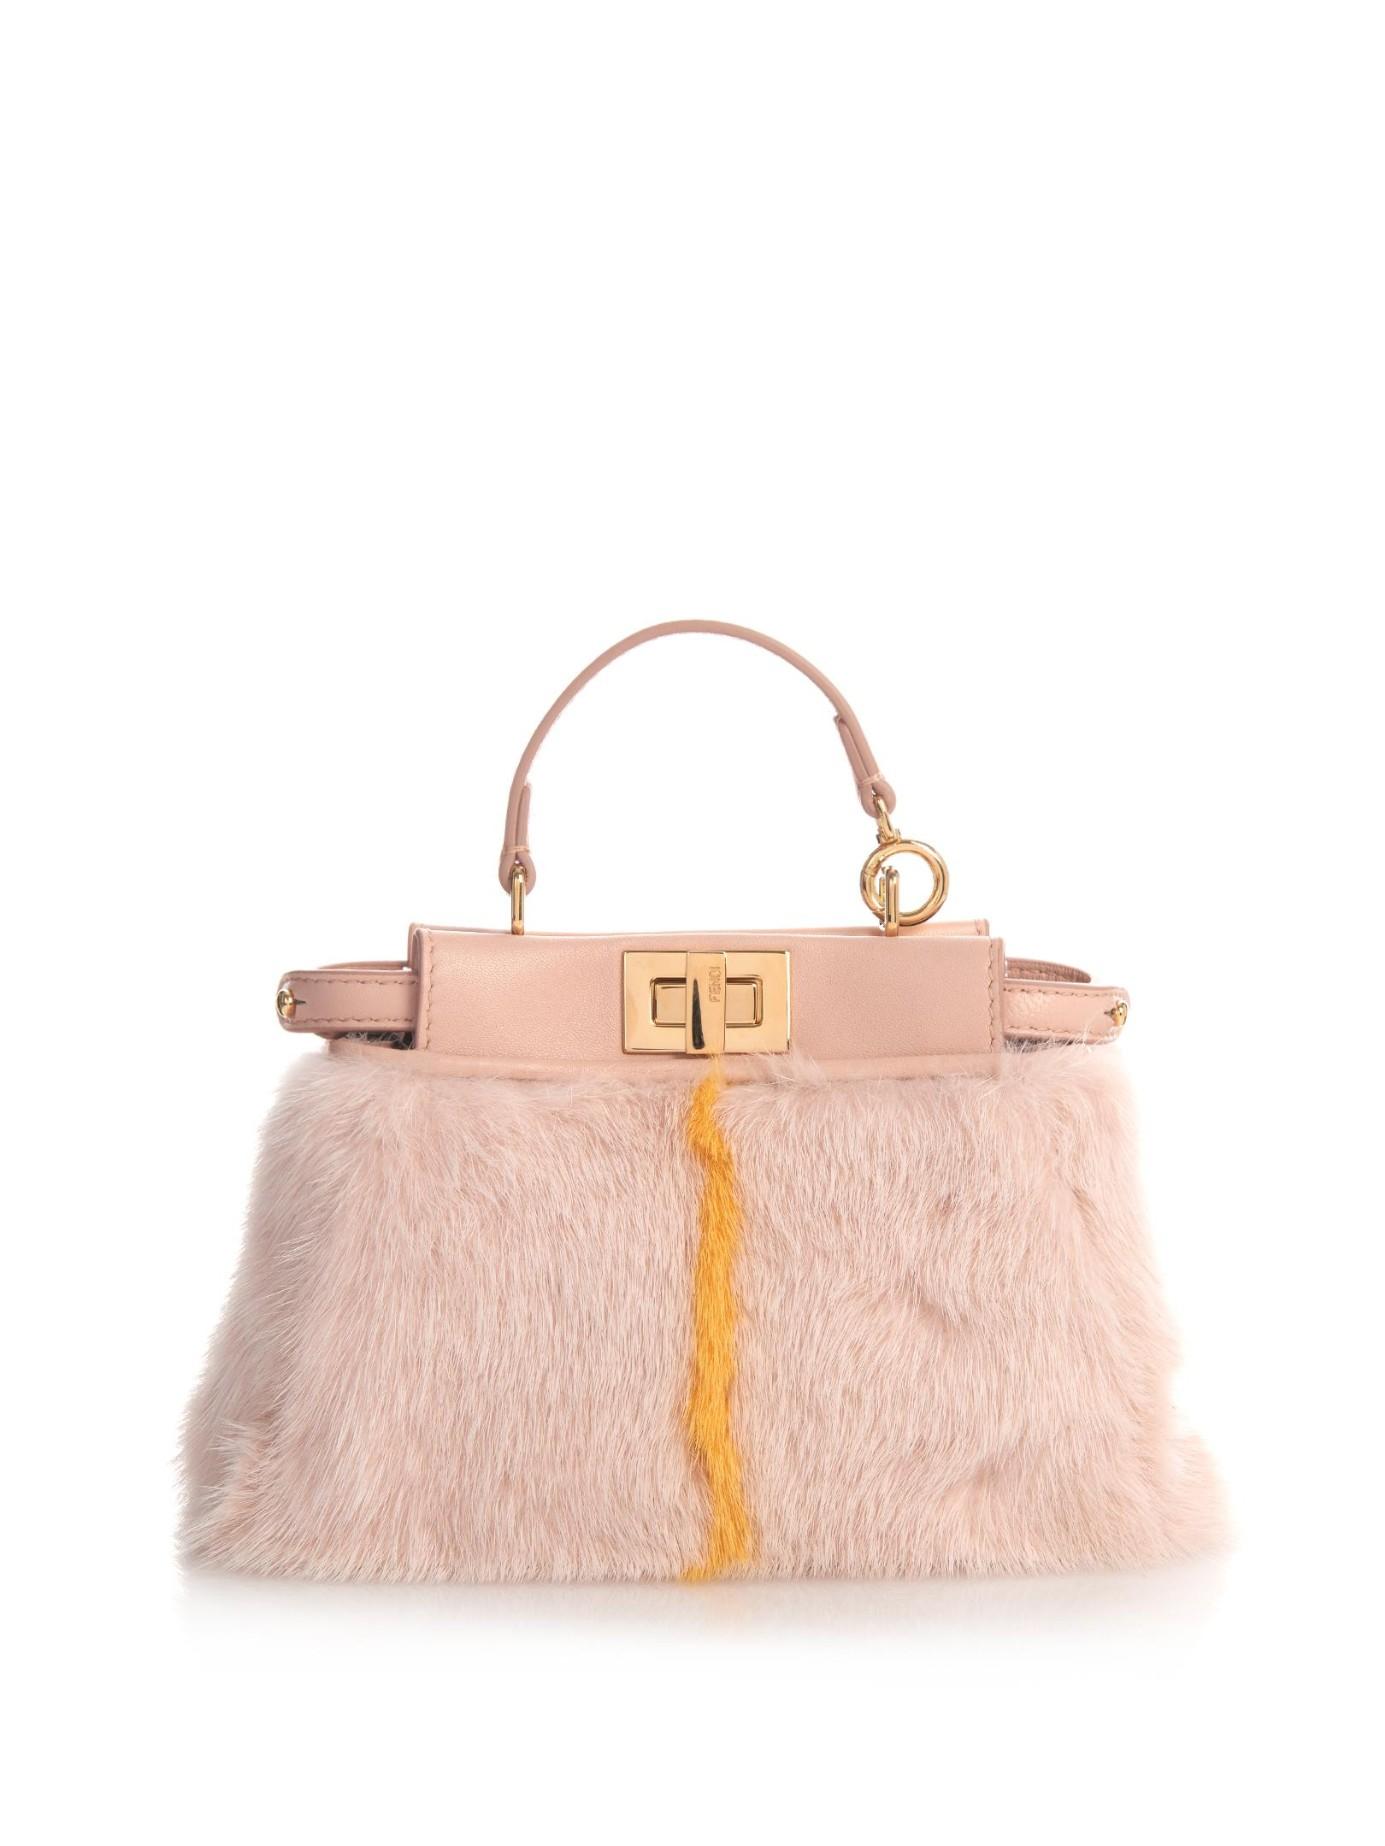 fendi micro peekaboo mink fur cross body bag in pink lyst. Black Bedroom Furniture Sets. Home Design Ideas